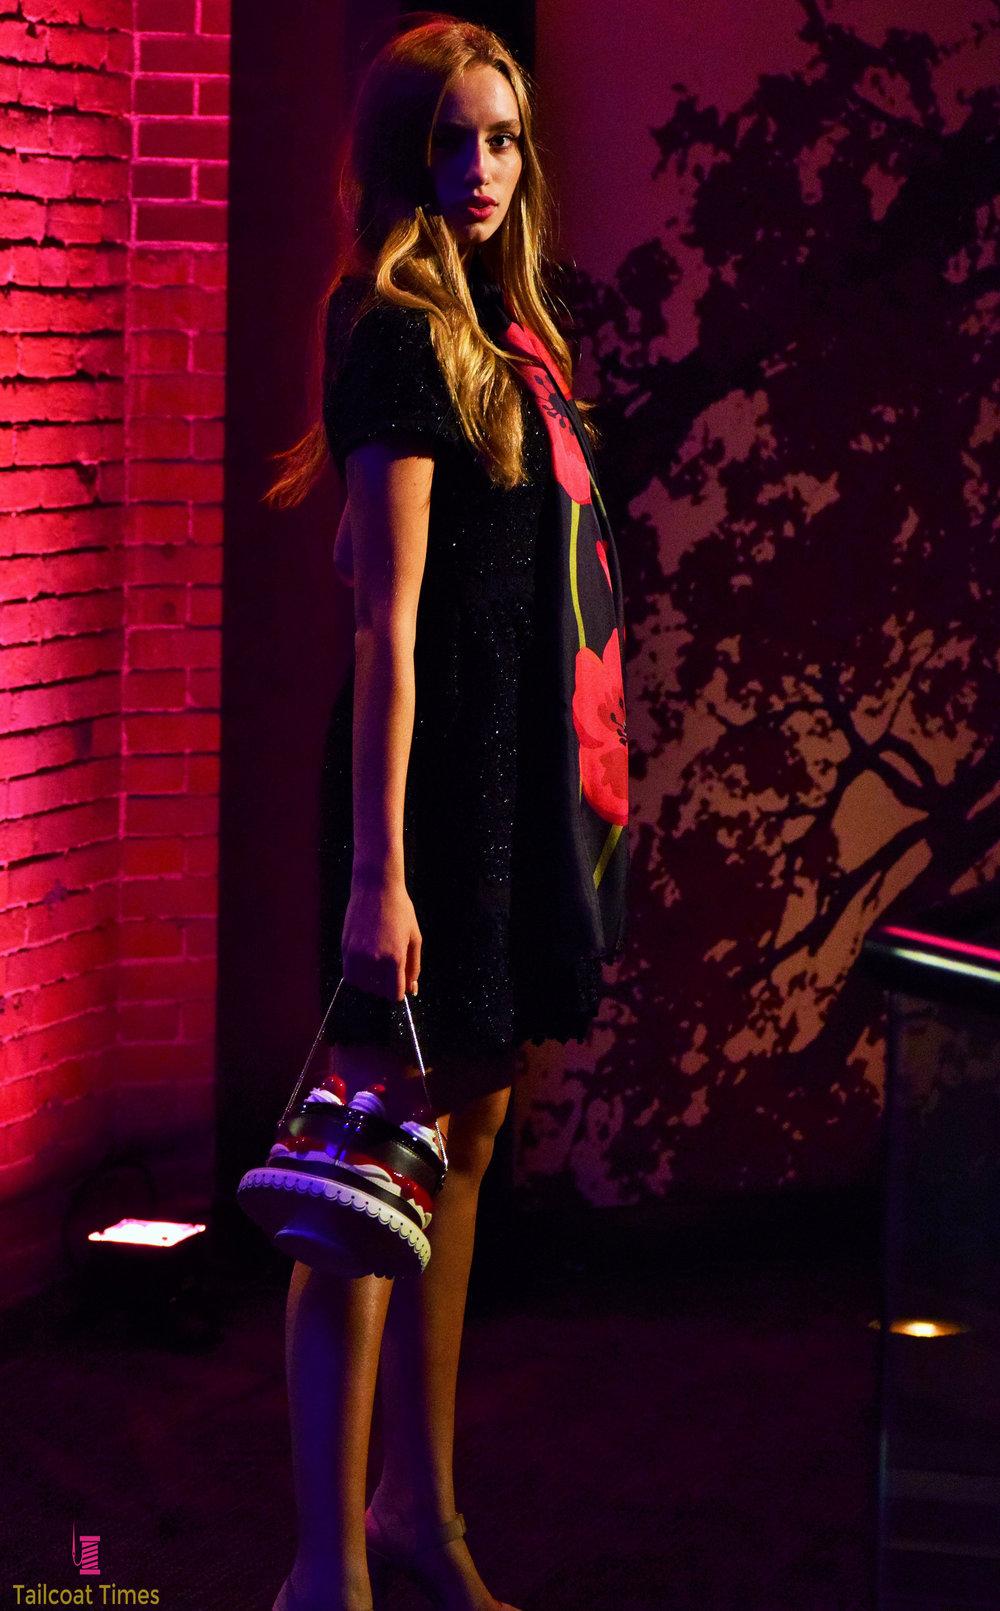 FashionablyLate_Kate Spade_Tailcoat Times (15 of 23).jpg